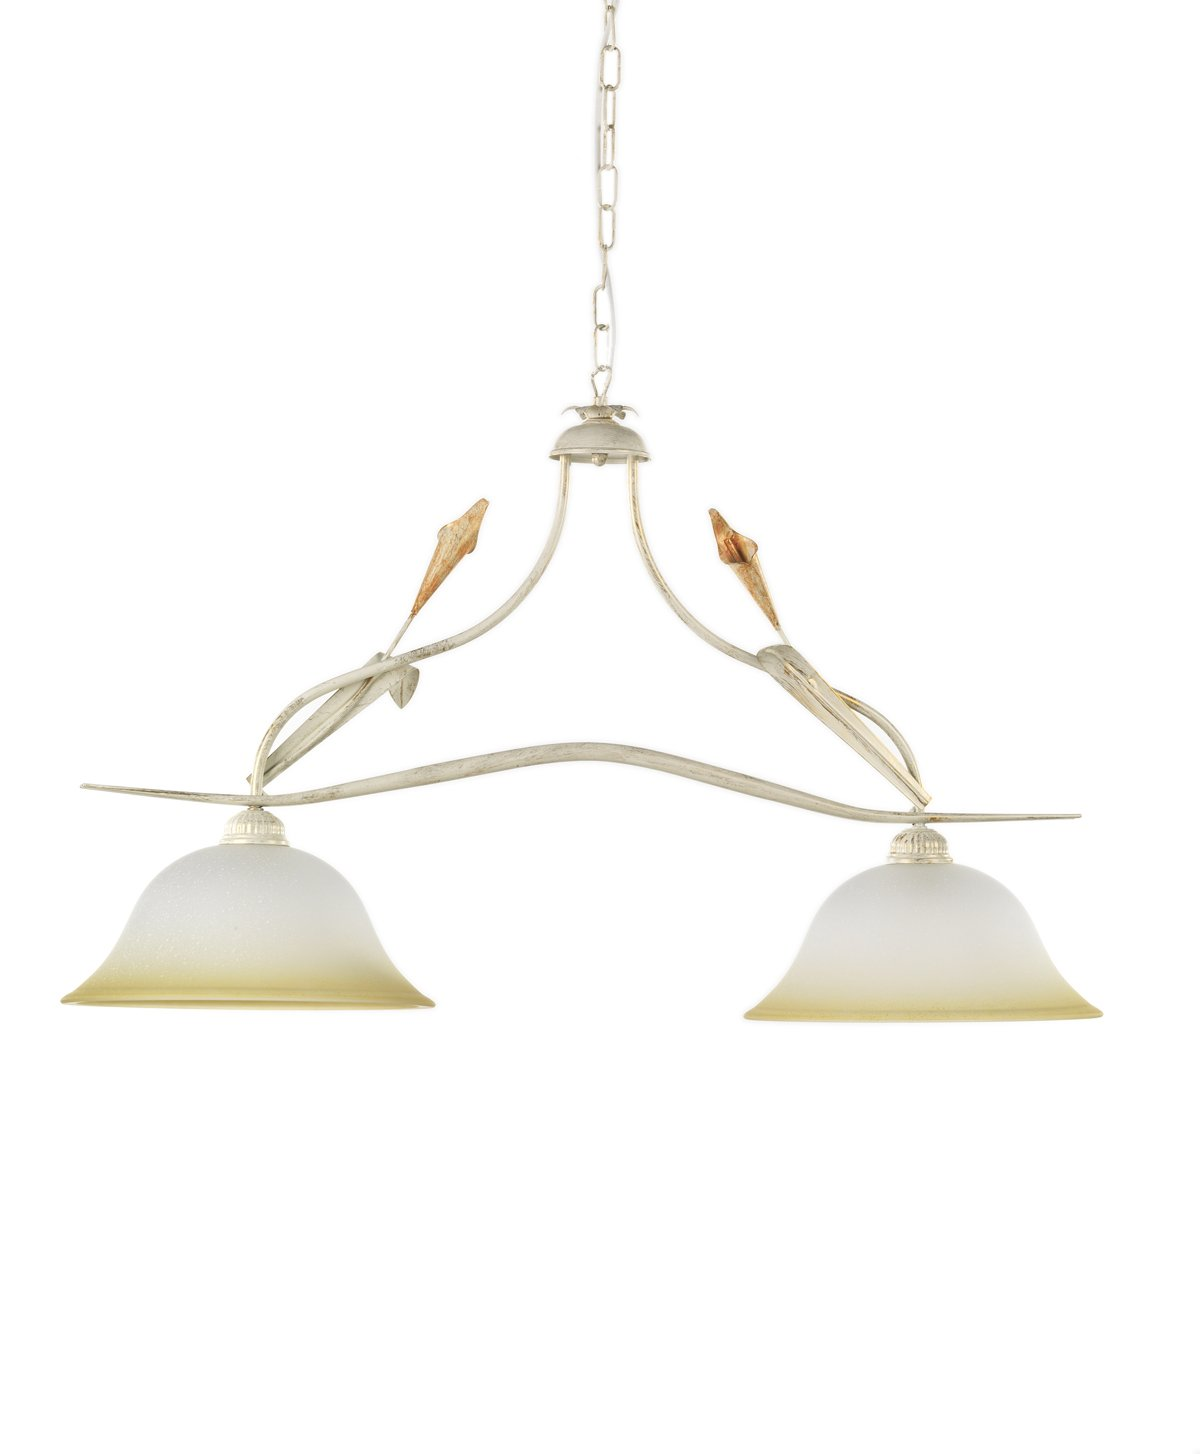 onli Lucrezia lámpara Billar E27, Marfil, 85 x h 110 cm: Amazon.es ...